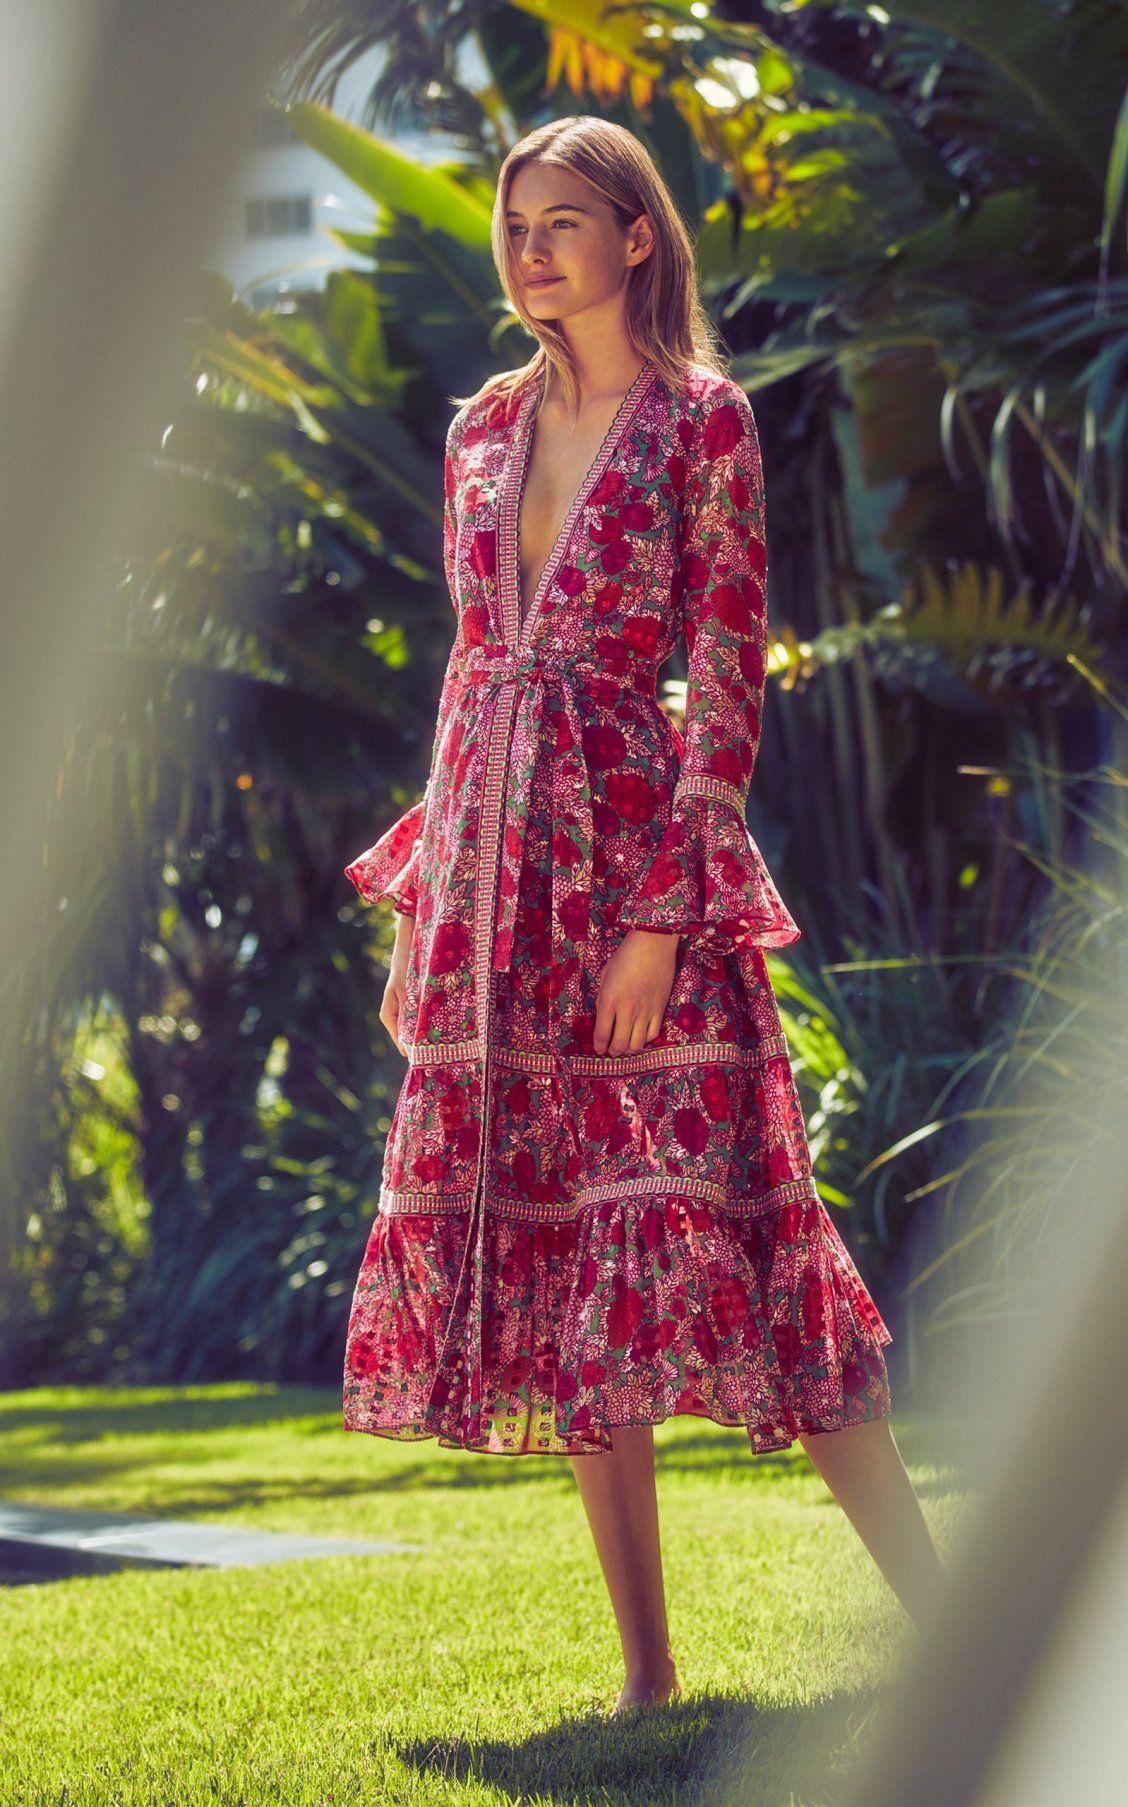 Marcas Long Sleeve Printed Midi Dress By Alexis Spring Summer 19 Moda Operandi Fashion Fashion Dresses Midi Dress Summer [ 1807 x 1128 Pixel ]